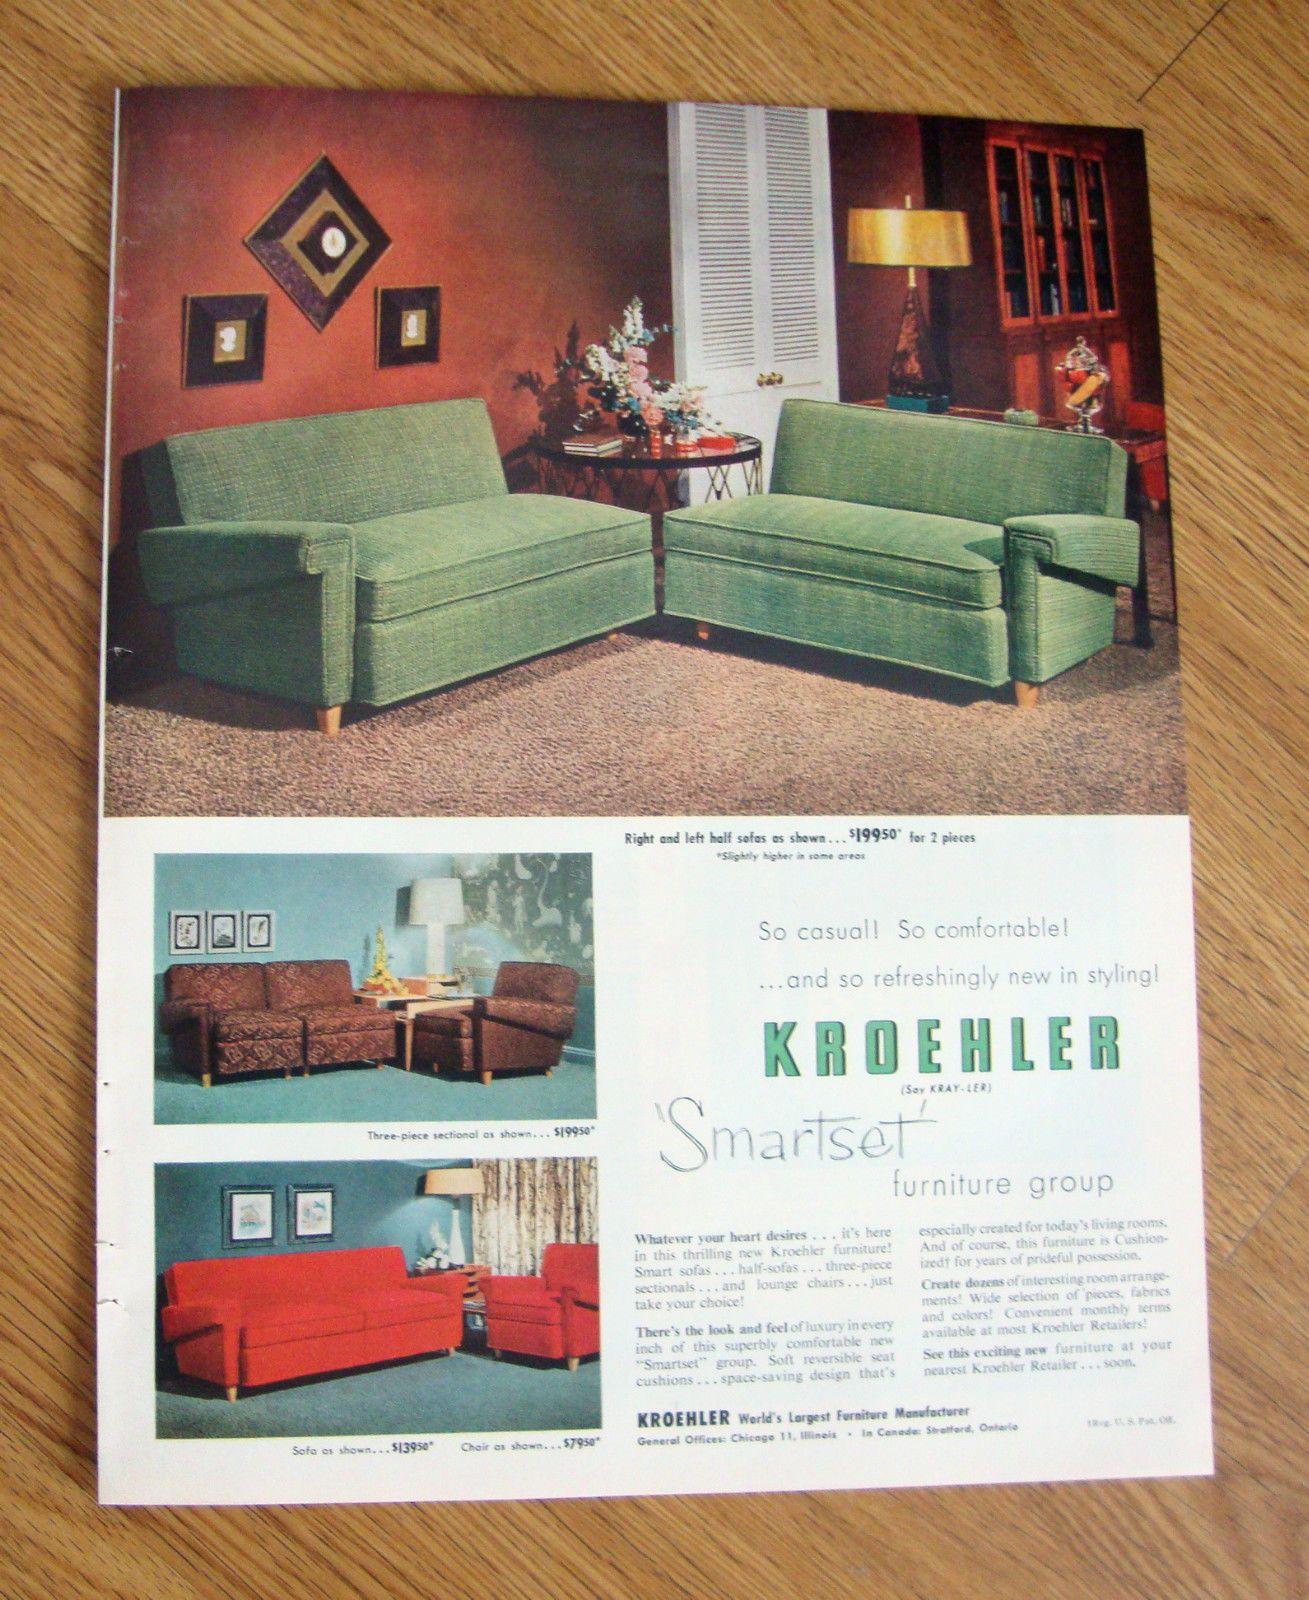 1953 Kroehler Furniture Ad Right Left Half Sofas Kroehler Furniture Furniture Furniture Ads